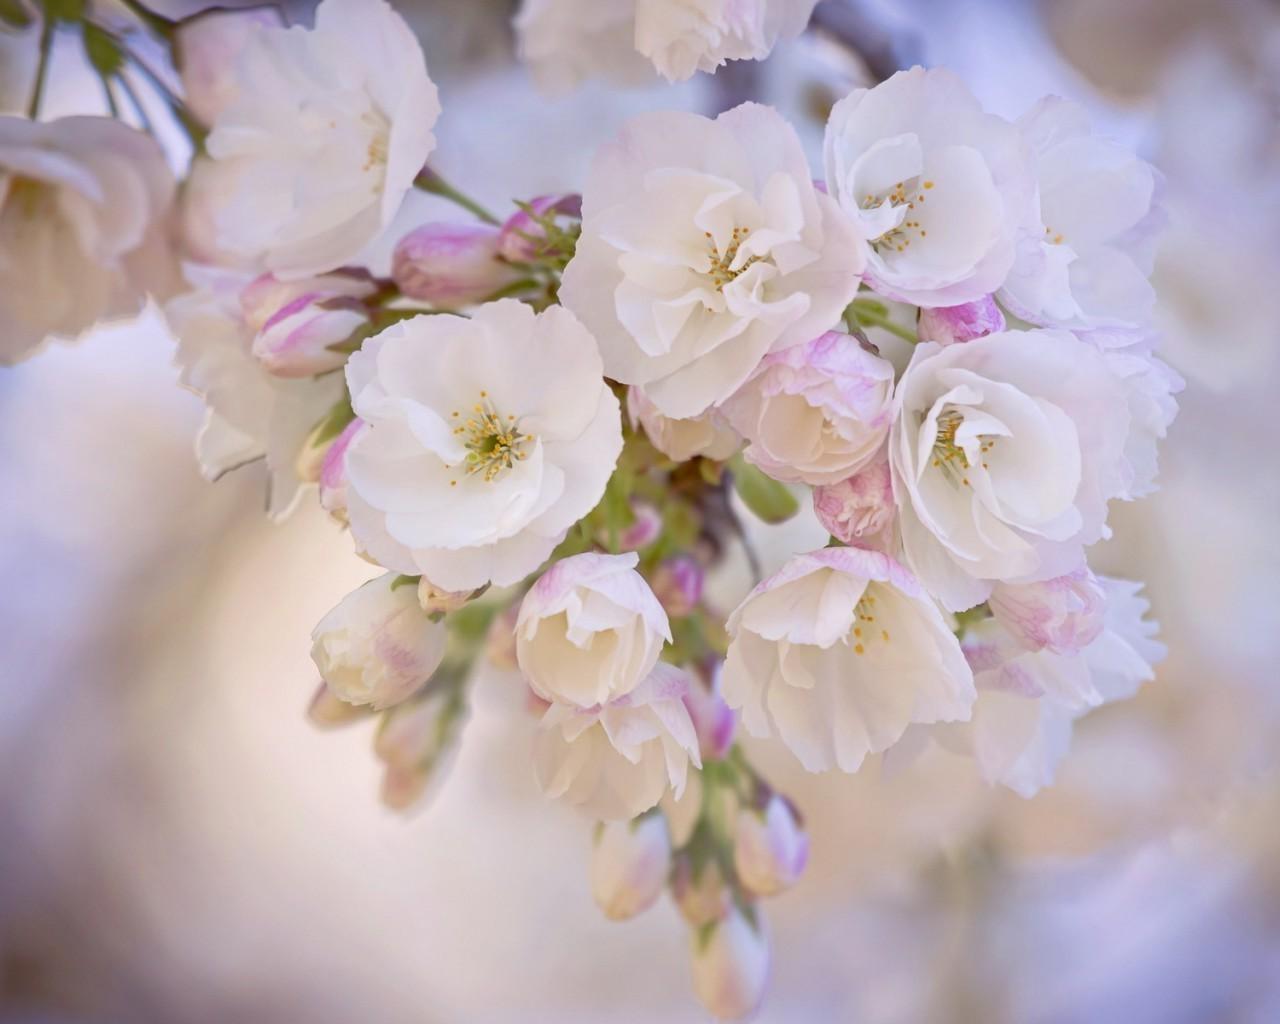 Весна - обои на телефон бесплатно.  Обои на Телефон Цветы